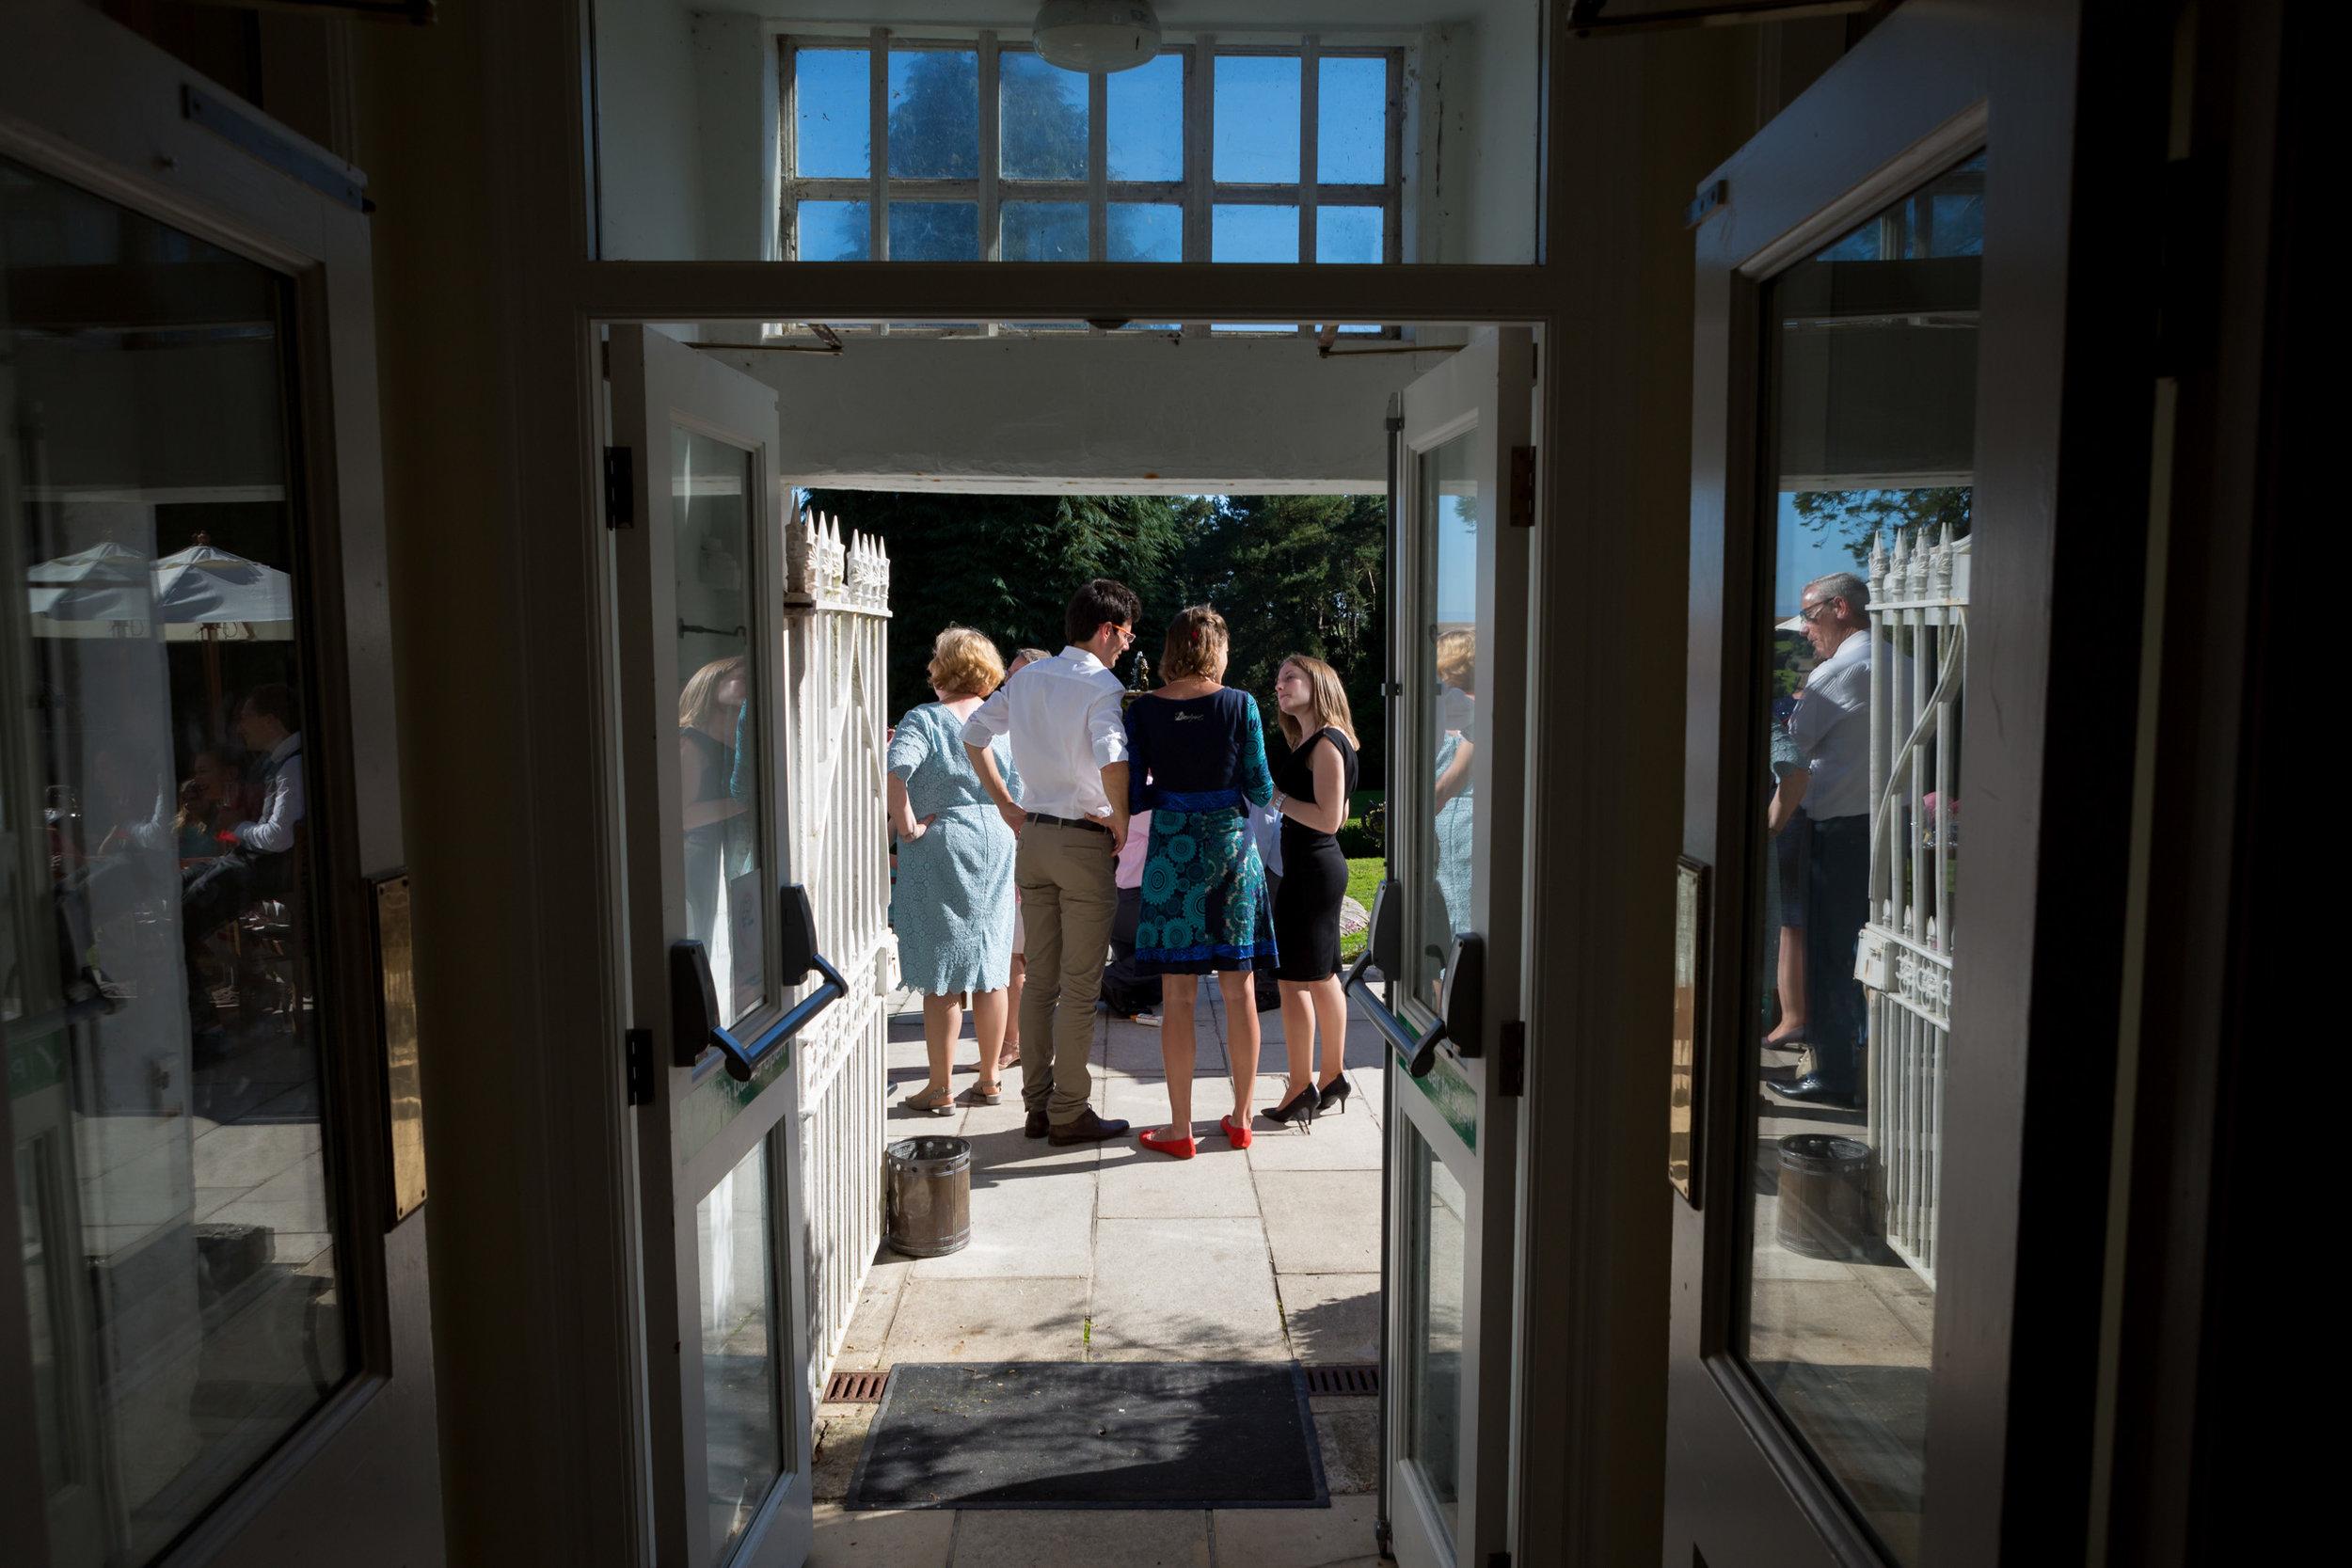 Bucklands-Tout-Saints-Hotel-Devon-Wedding-Photography-28.jpg